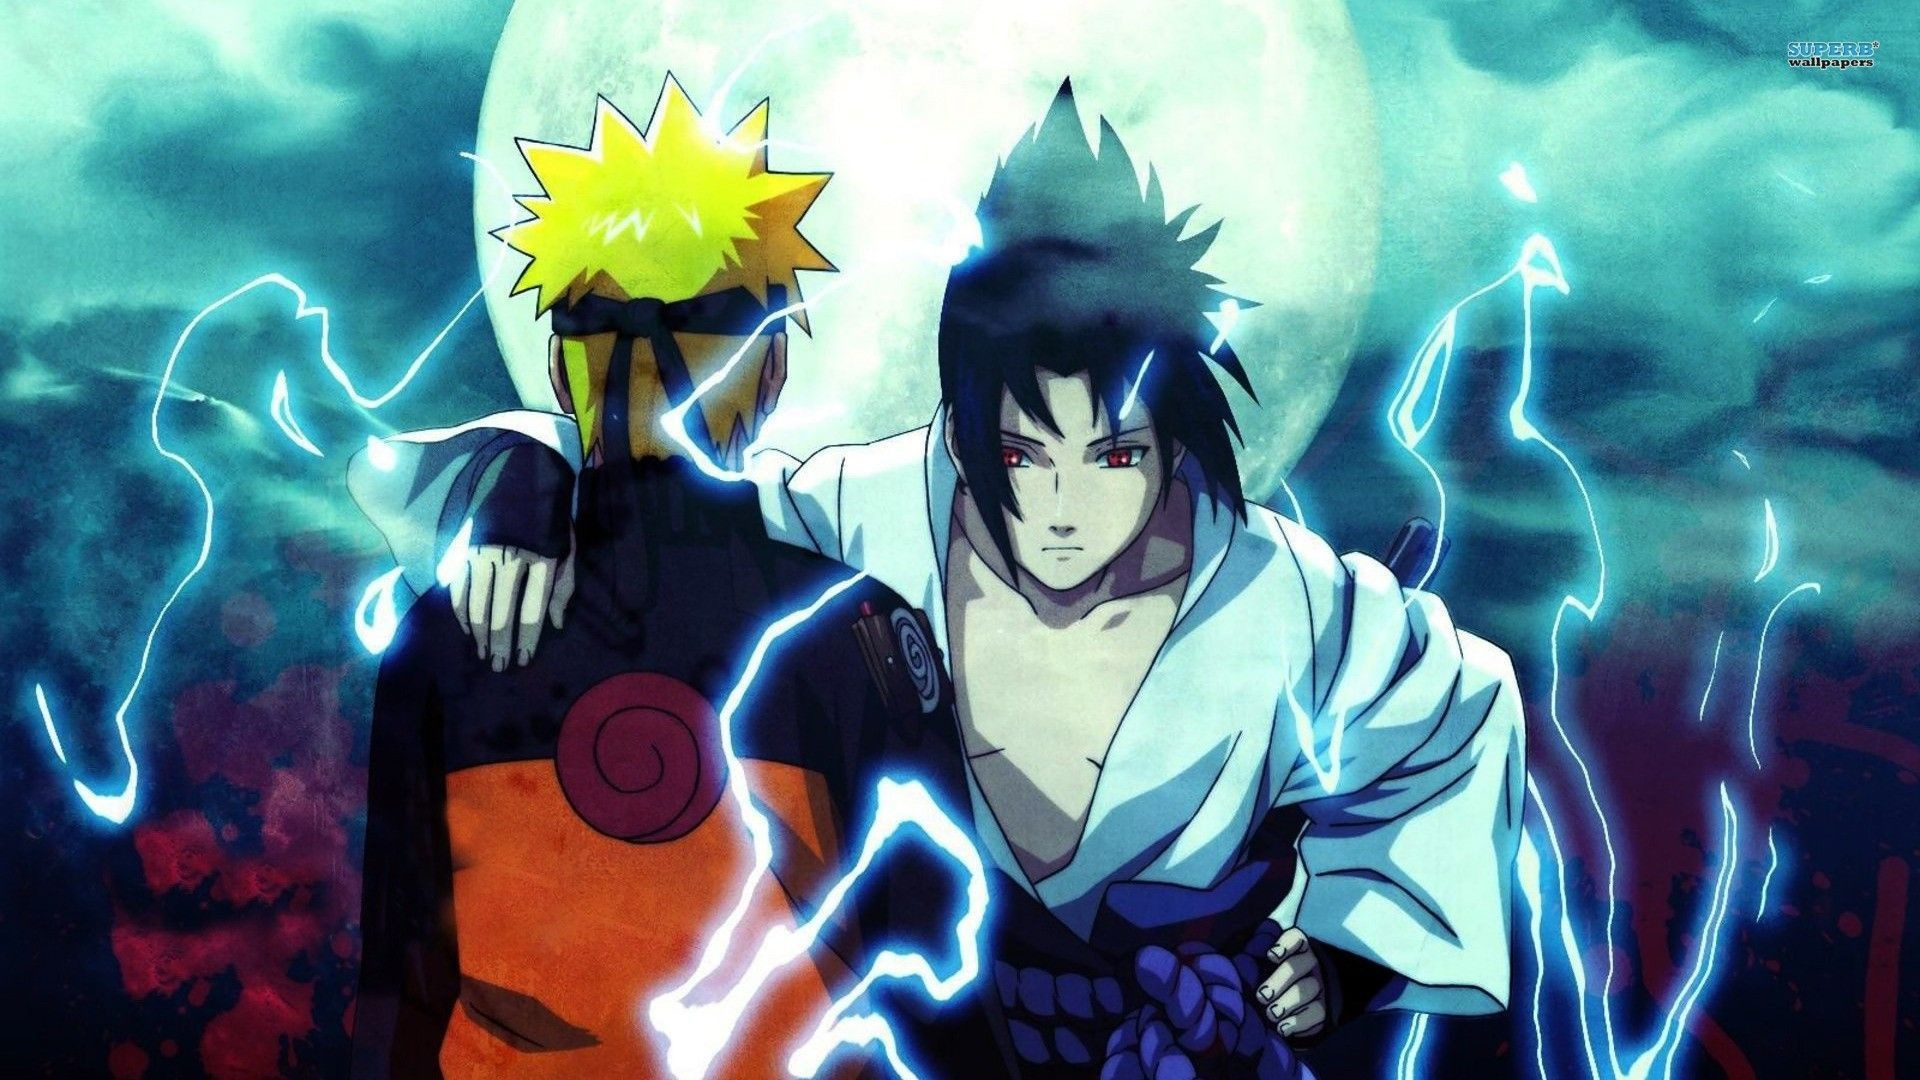 Naruto Sasuke Shippuden Pictures HD Wallpaper HD Wallpaper of